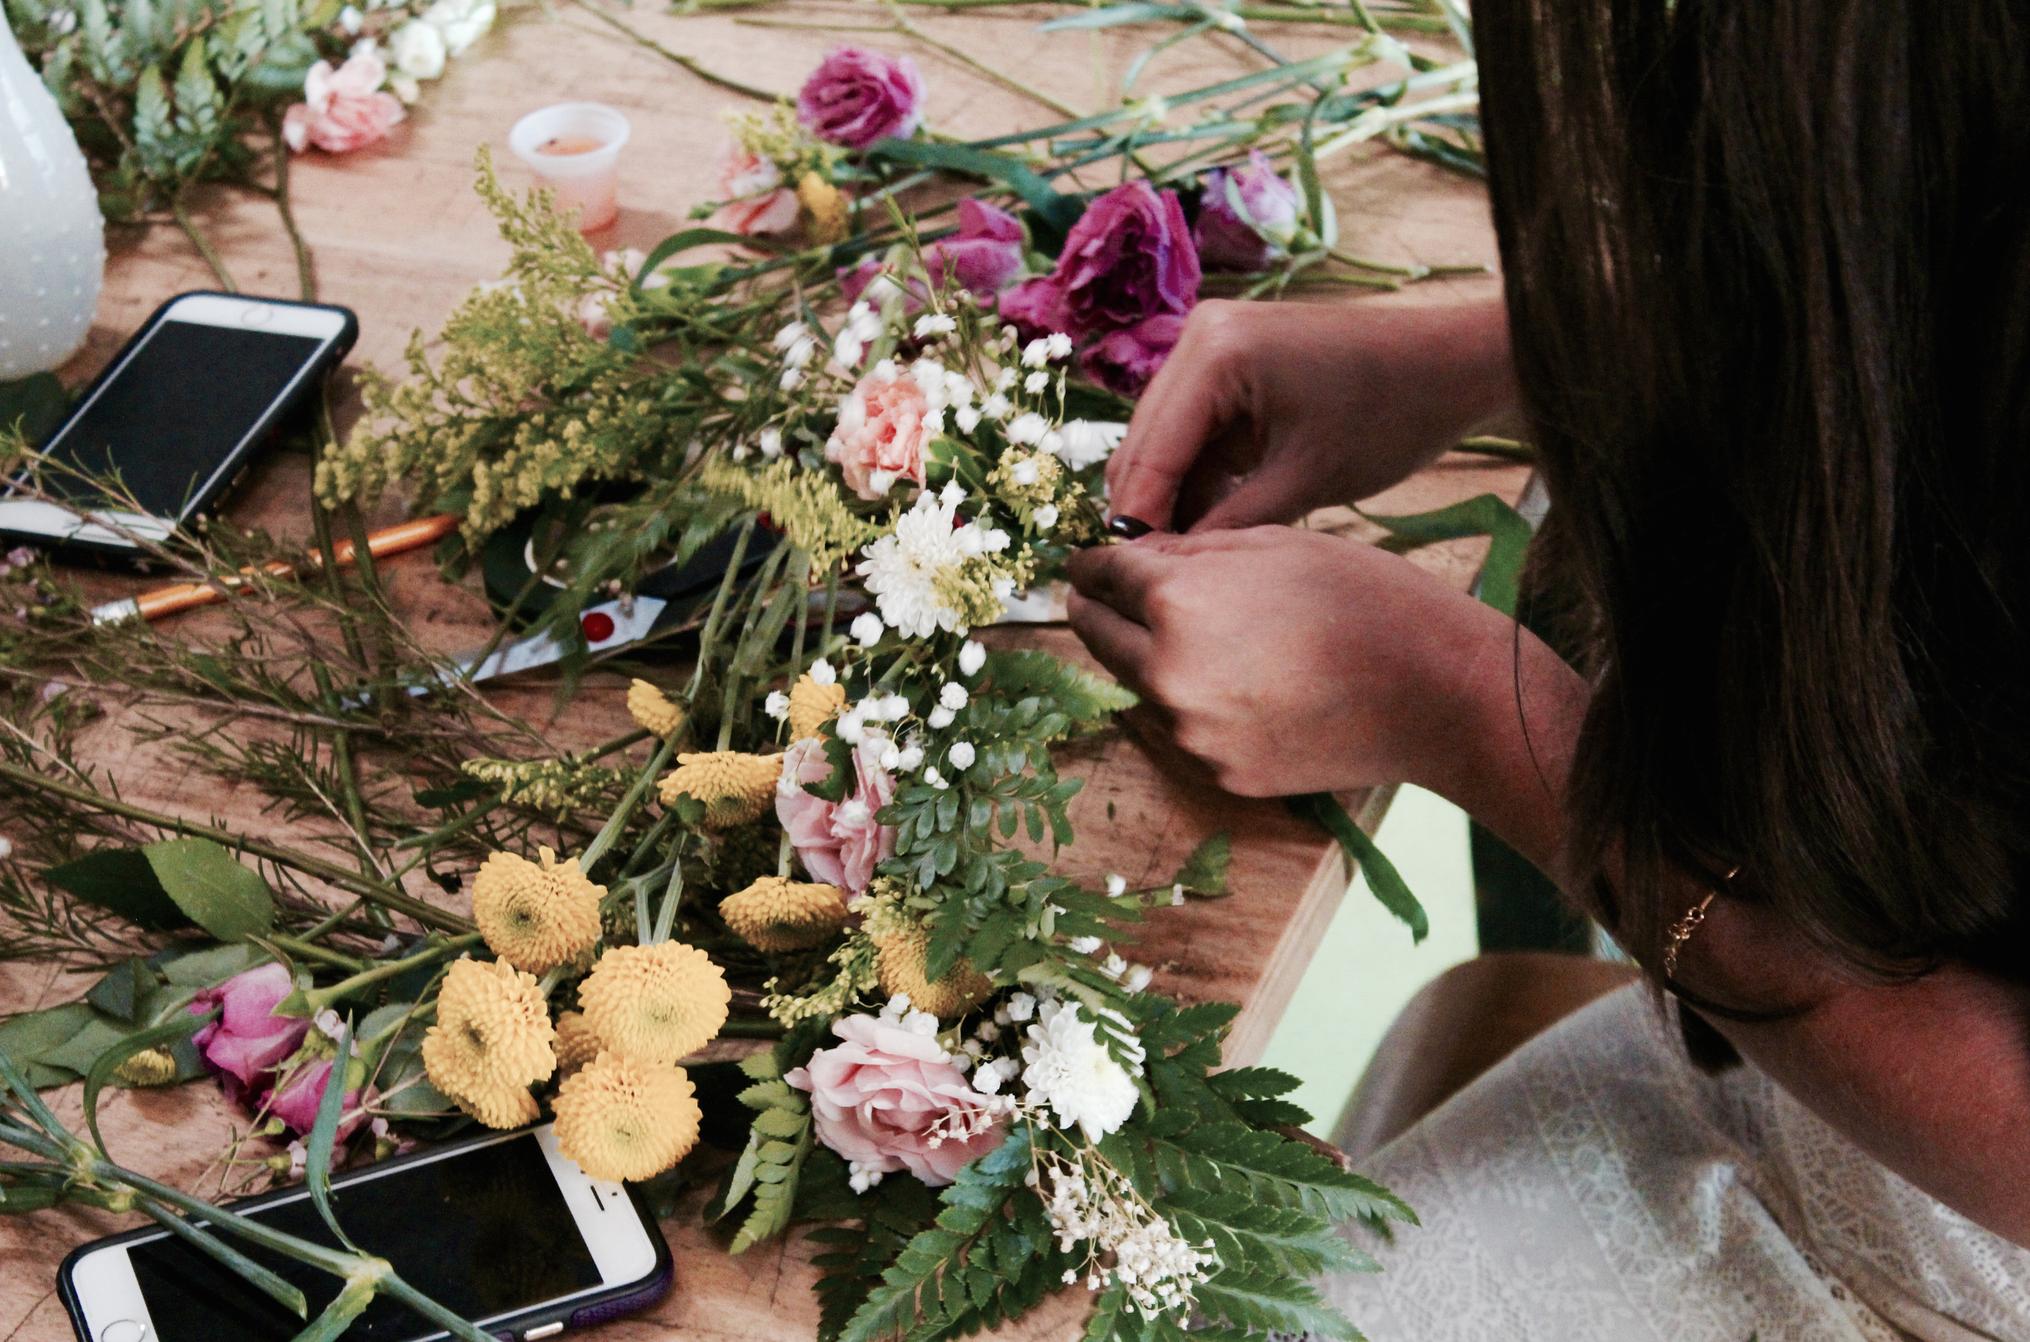 DIY Floral Workshop in Miami11